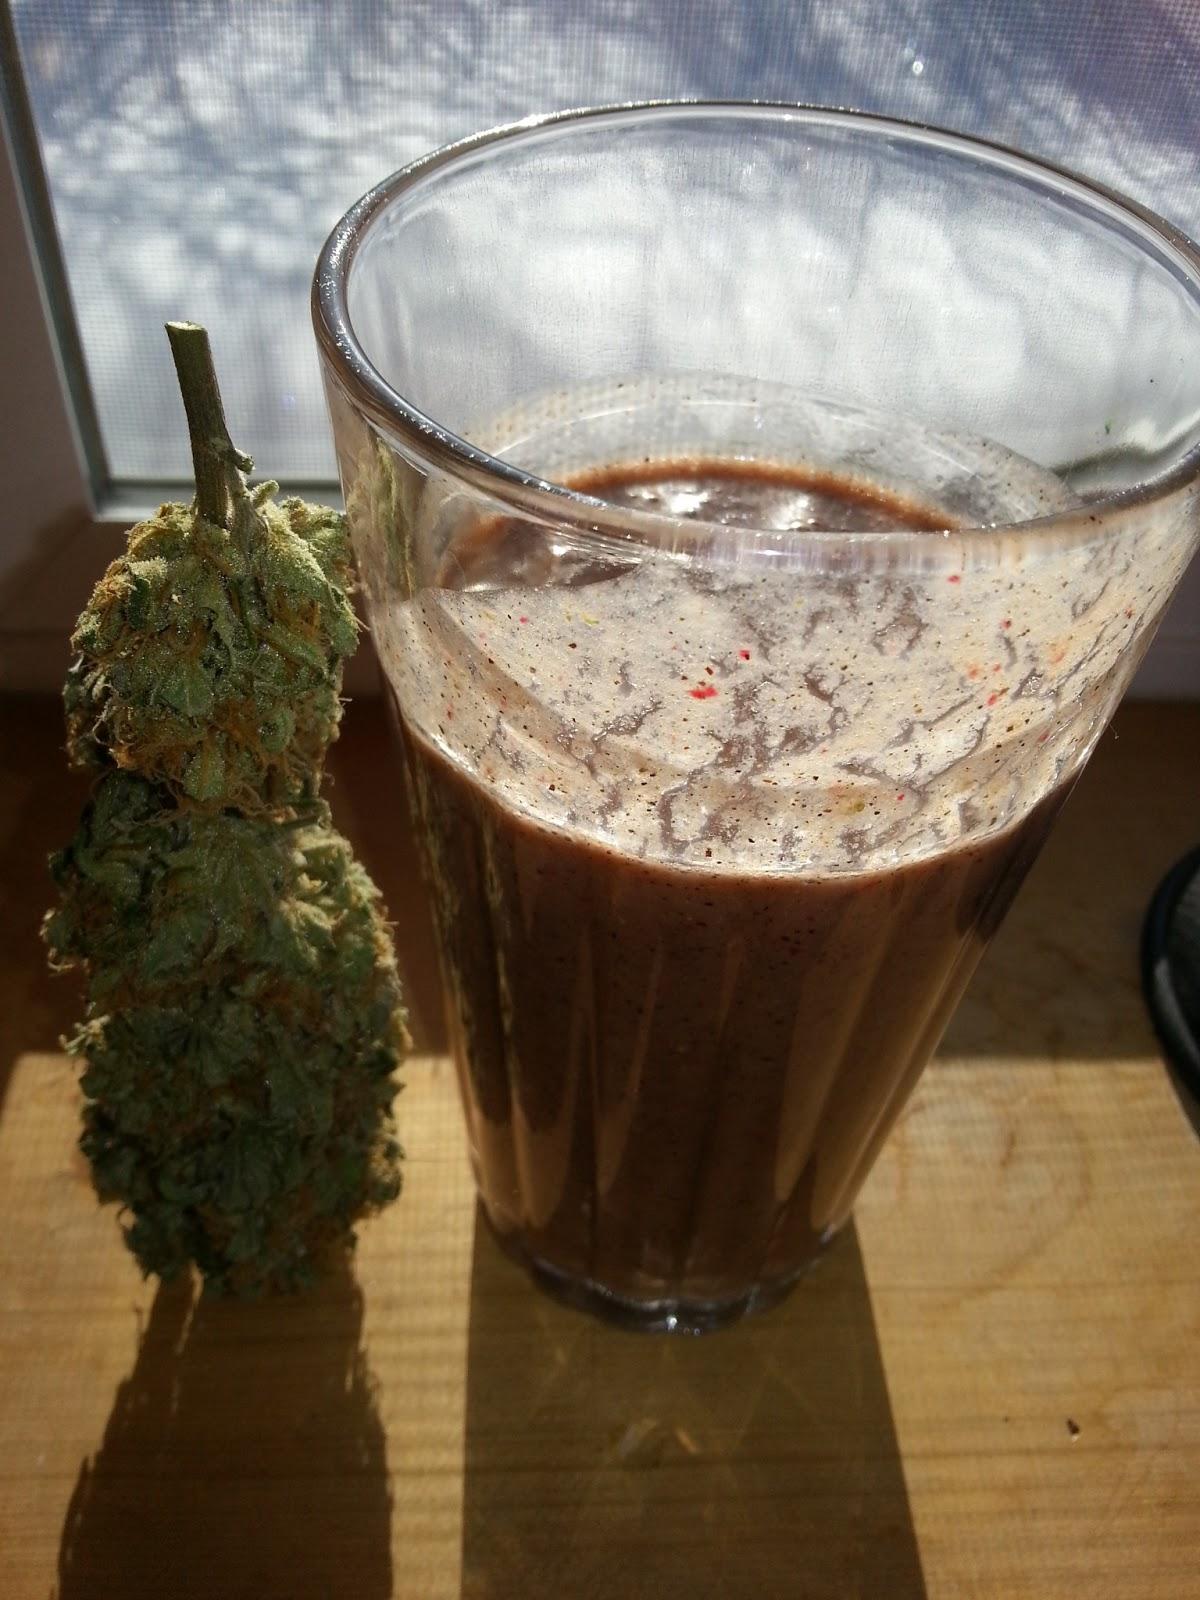 Strawberry Cough Chocolate Fruit Hemp Smoothie